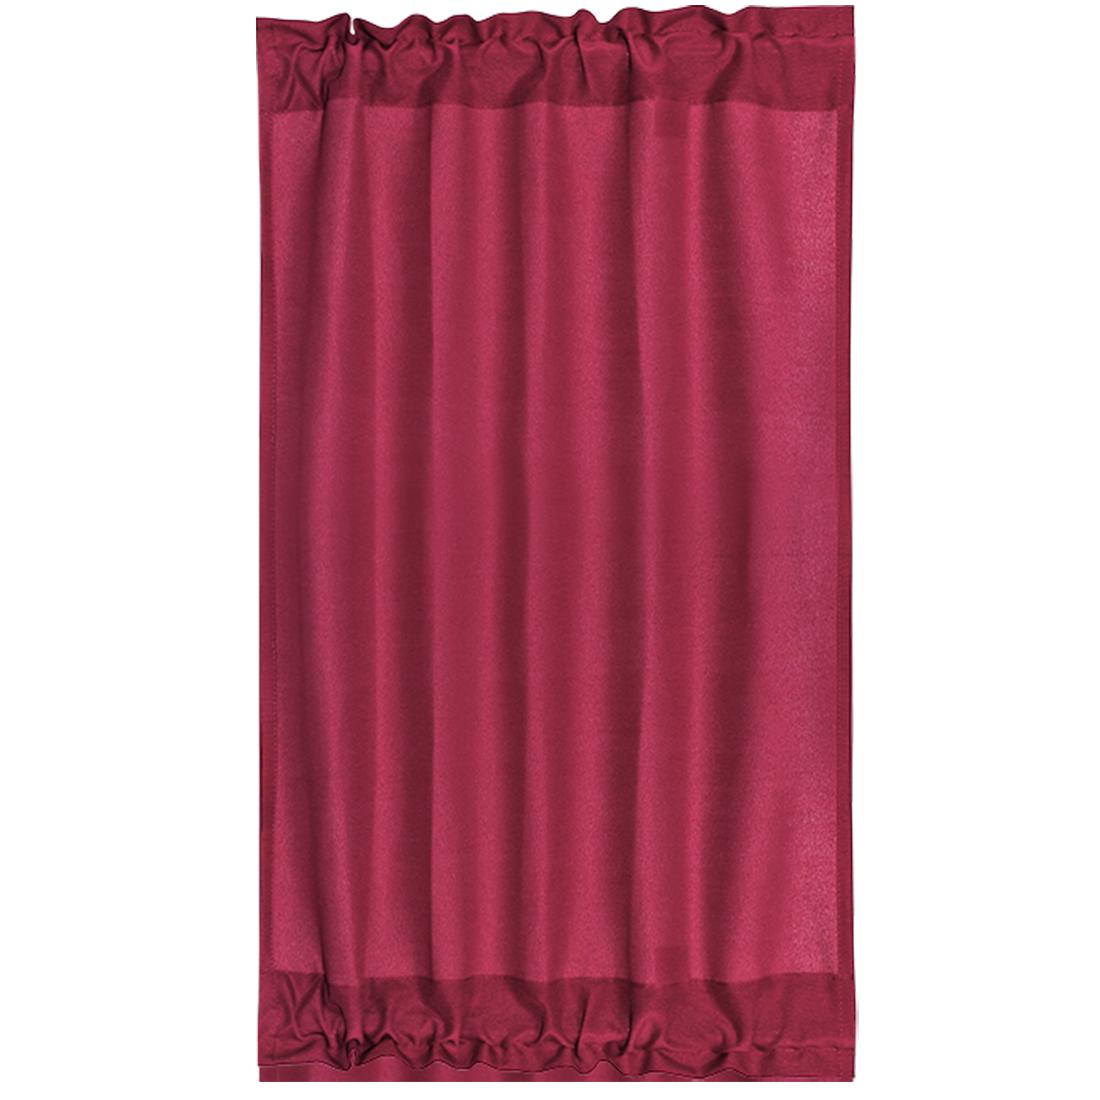 Elegant 25 x 40 Inch Blackout Curtains Rod Sliding Door Drapes Burgundy